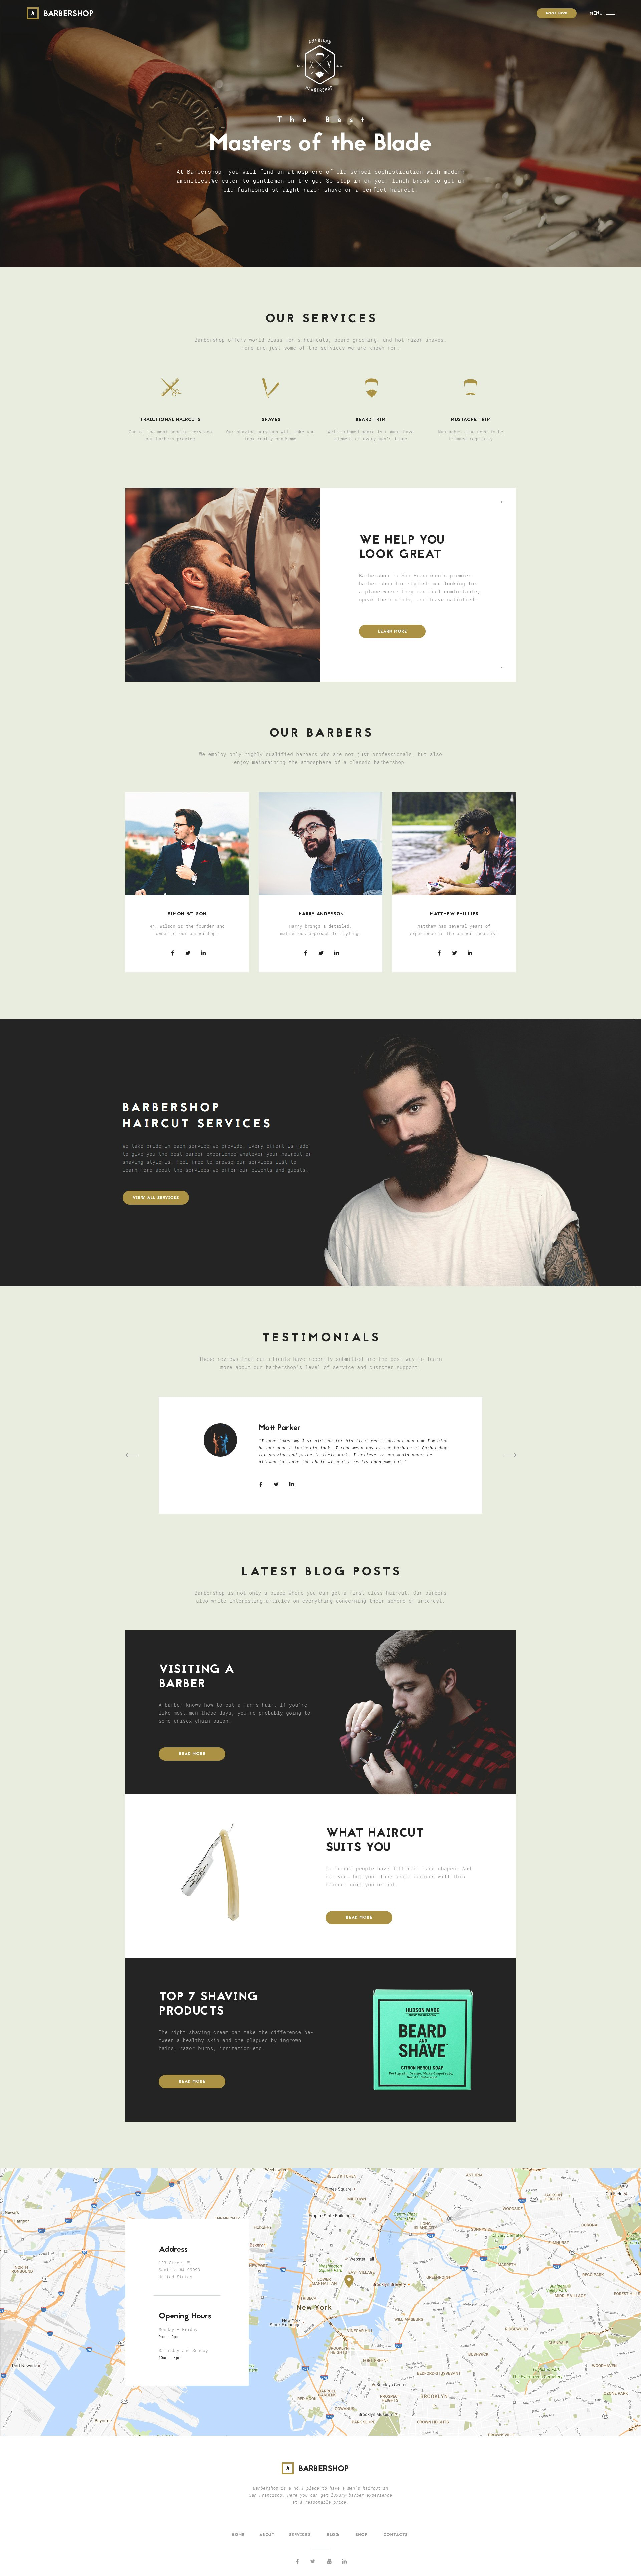 Barbershop - Hair Care & Hair Styling Website Template - screenshot